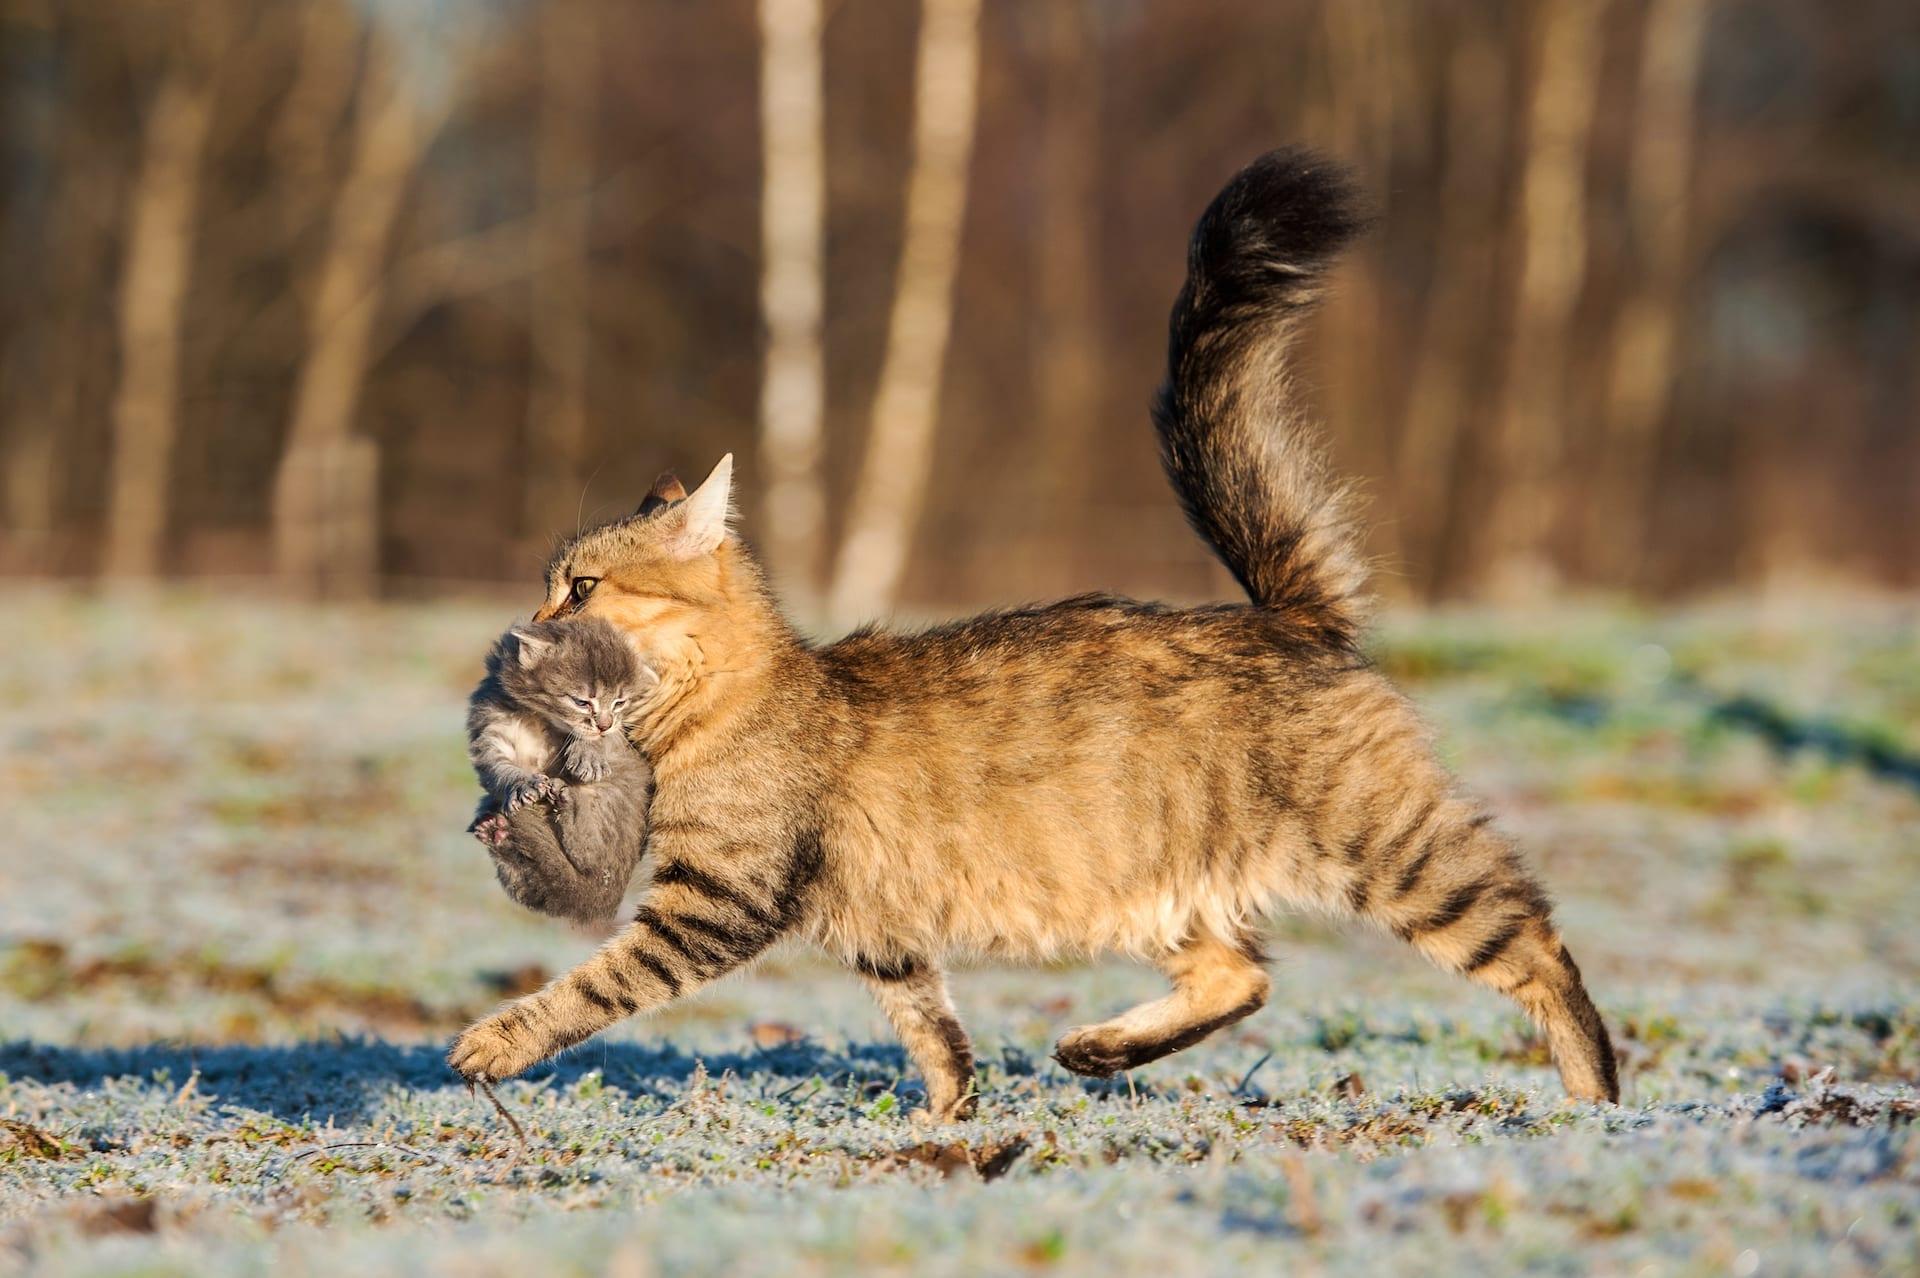 cat carrying her kitten